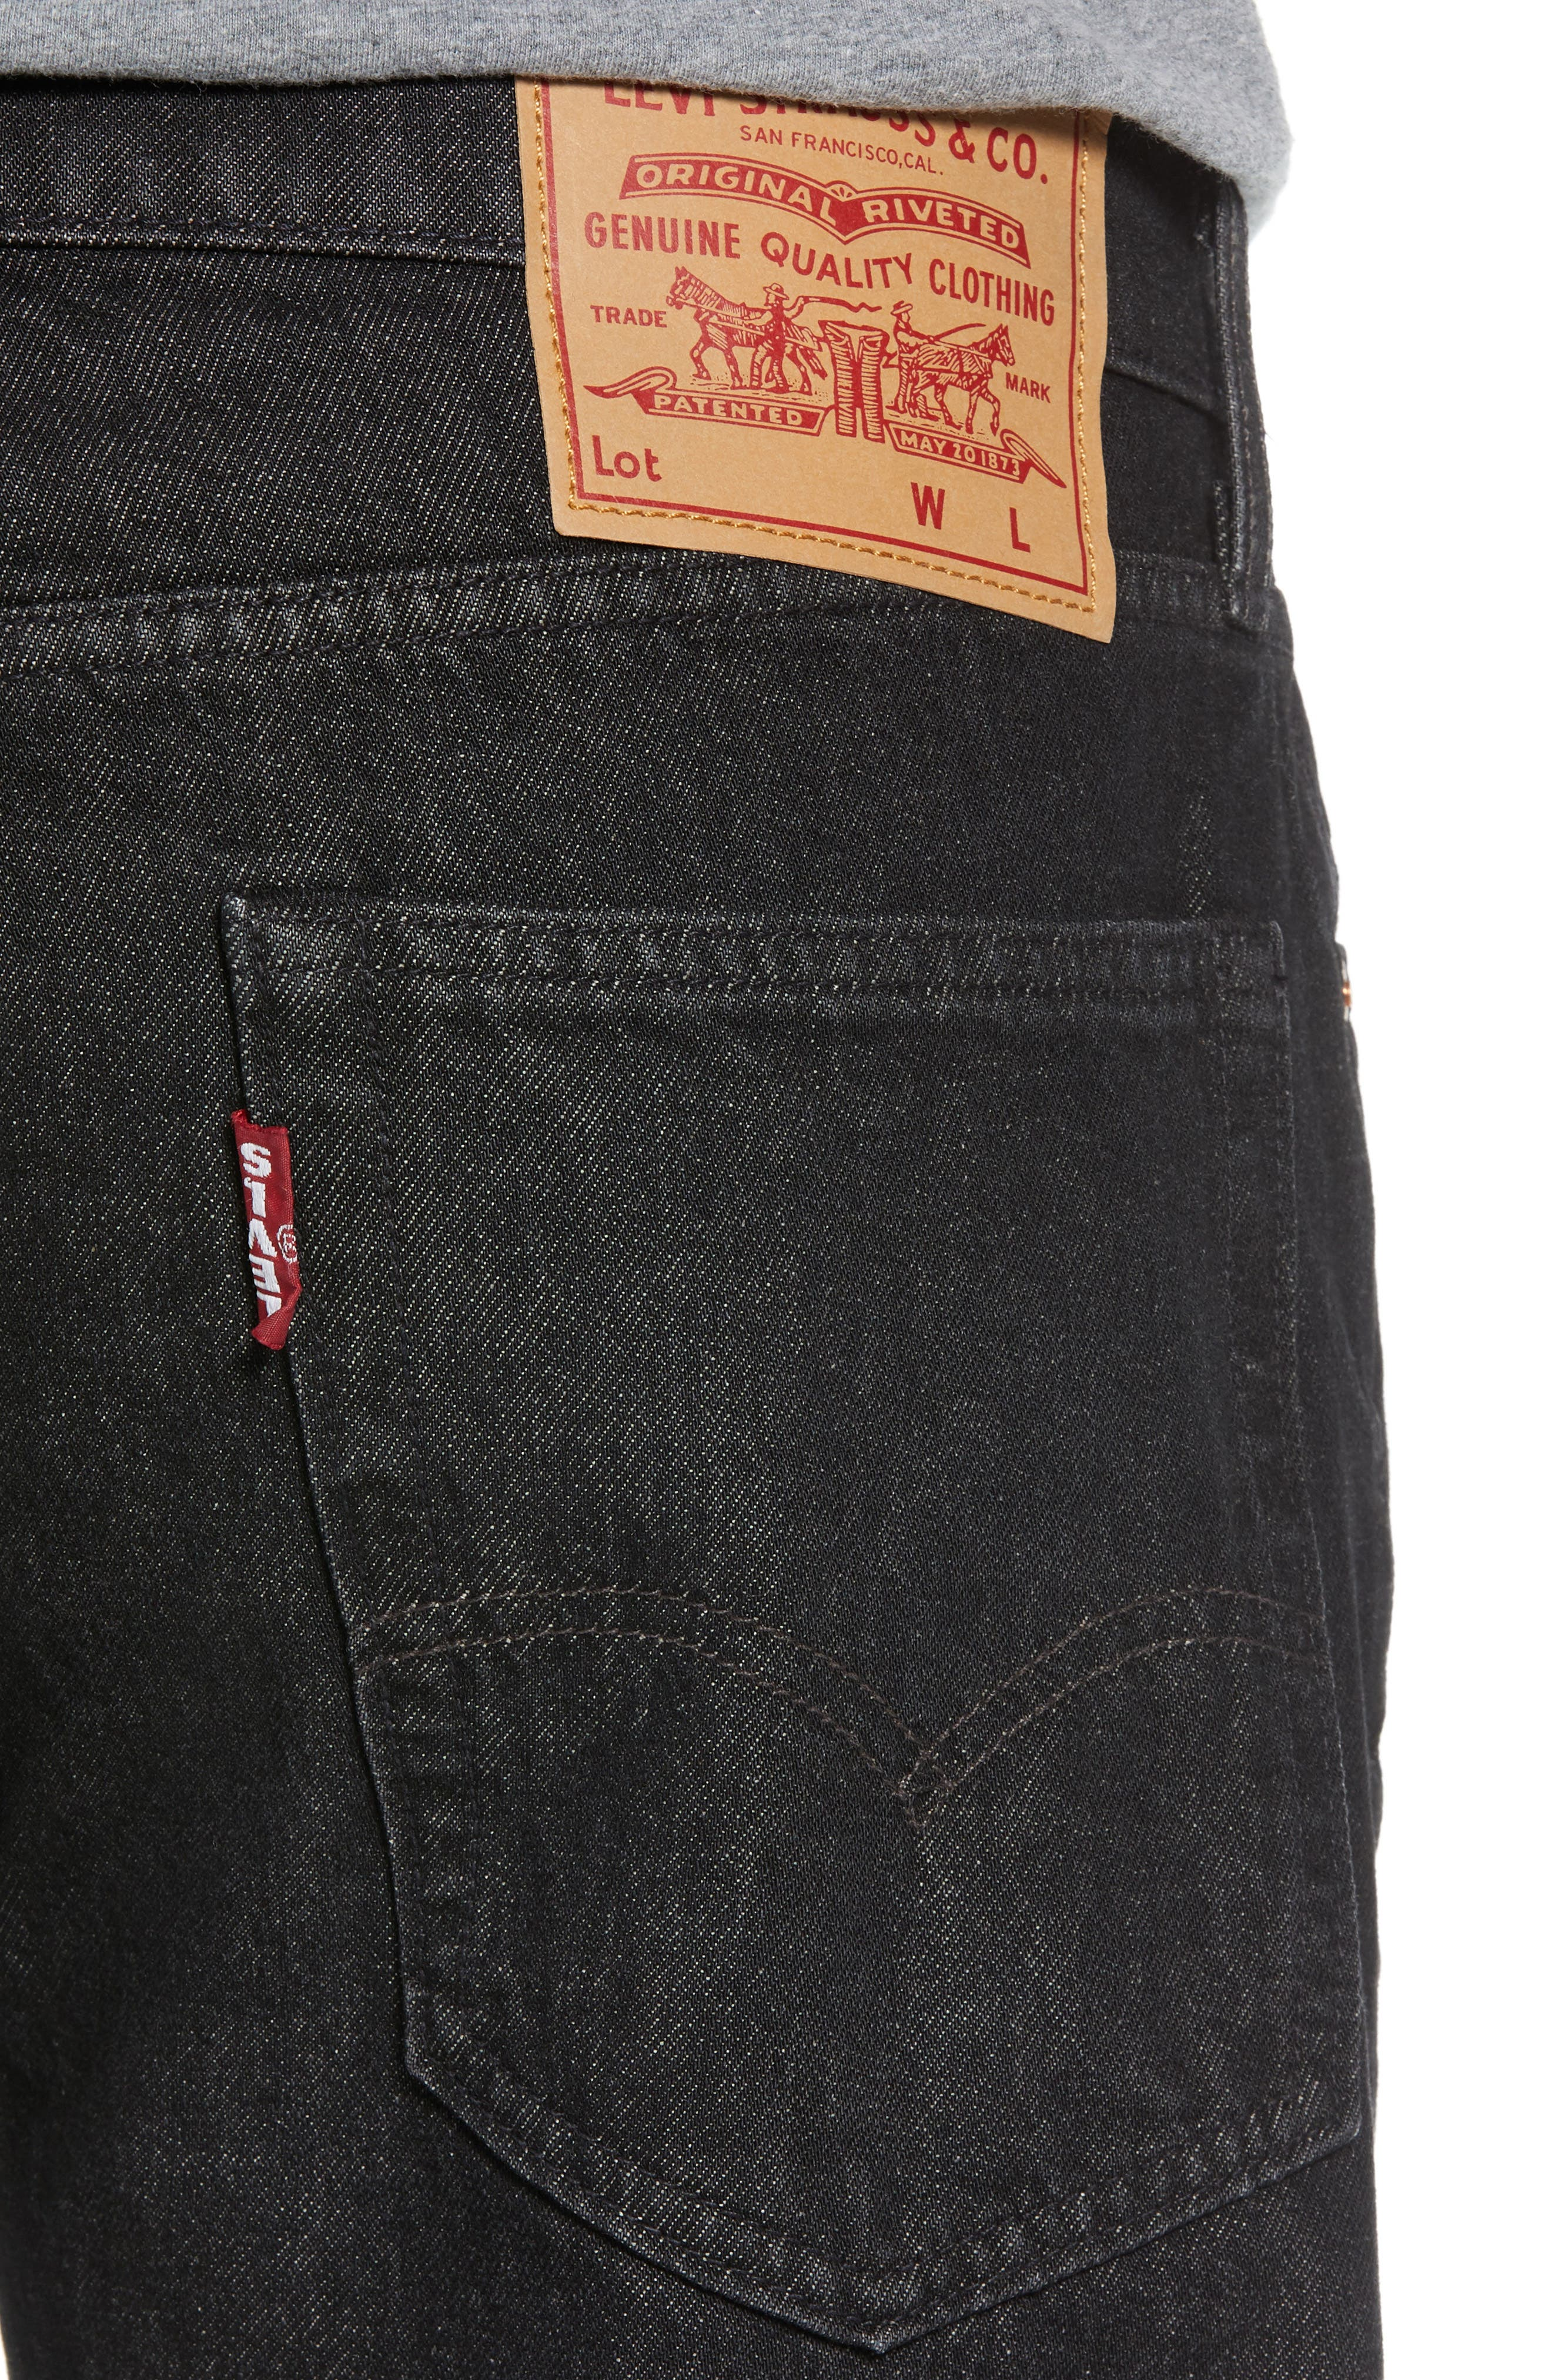 Hi-Ball Straight Fit Jeans,                             Alternate thumbnail 4, color,                             MEDIUM BLUE